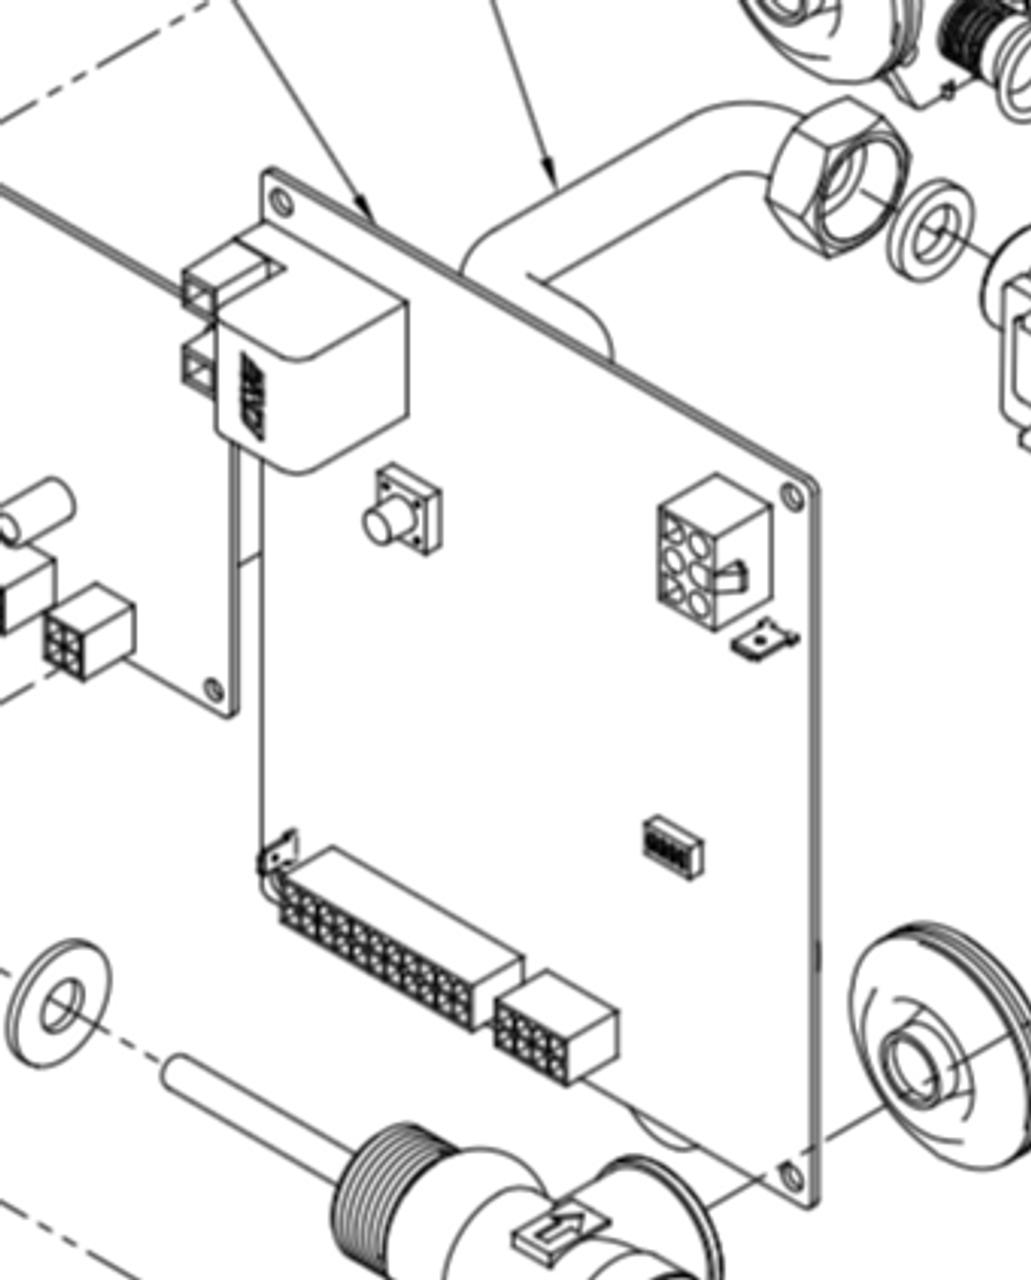 Suburban Rv Water Heater Parts Diagram : suburban, water, heater, parts, diagram, Suburban, Water, Heater, Module, Board, (Nautilus), Parts